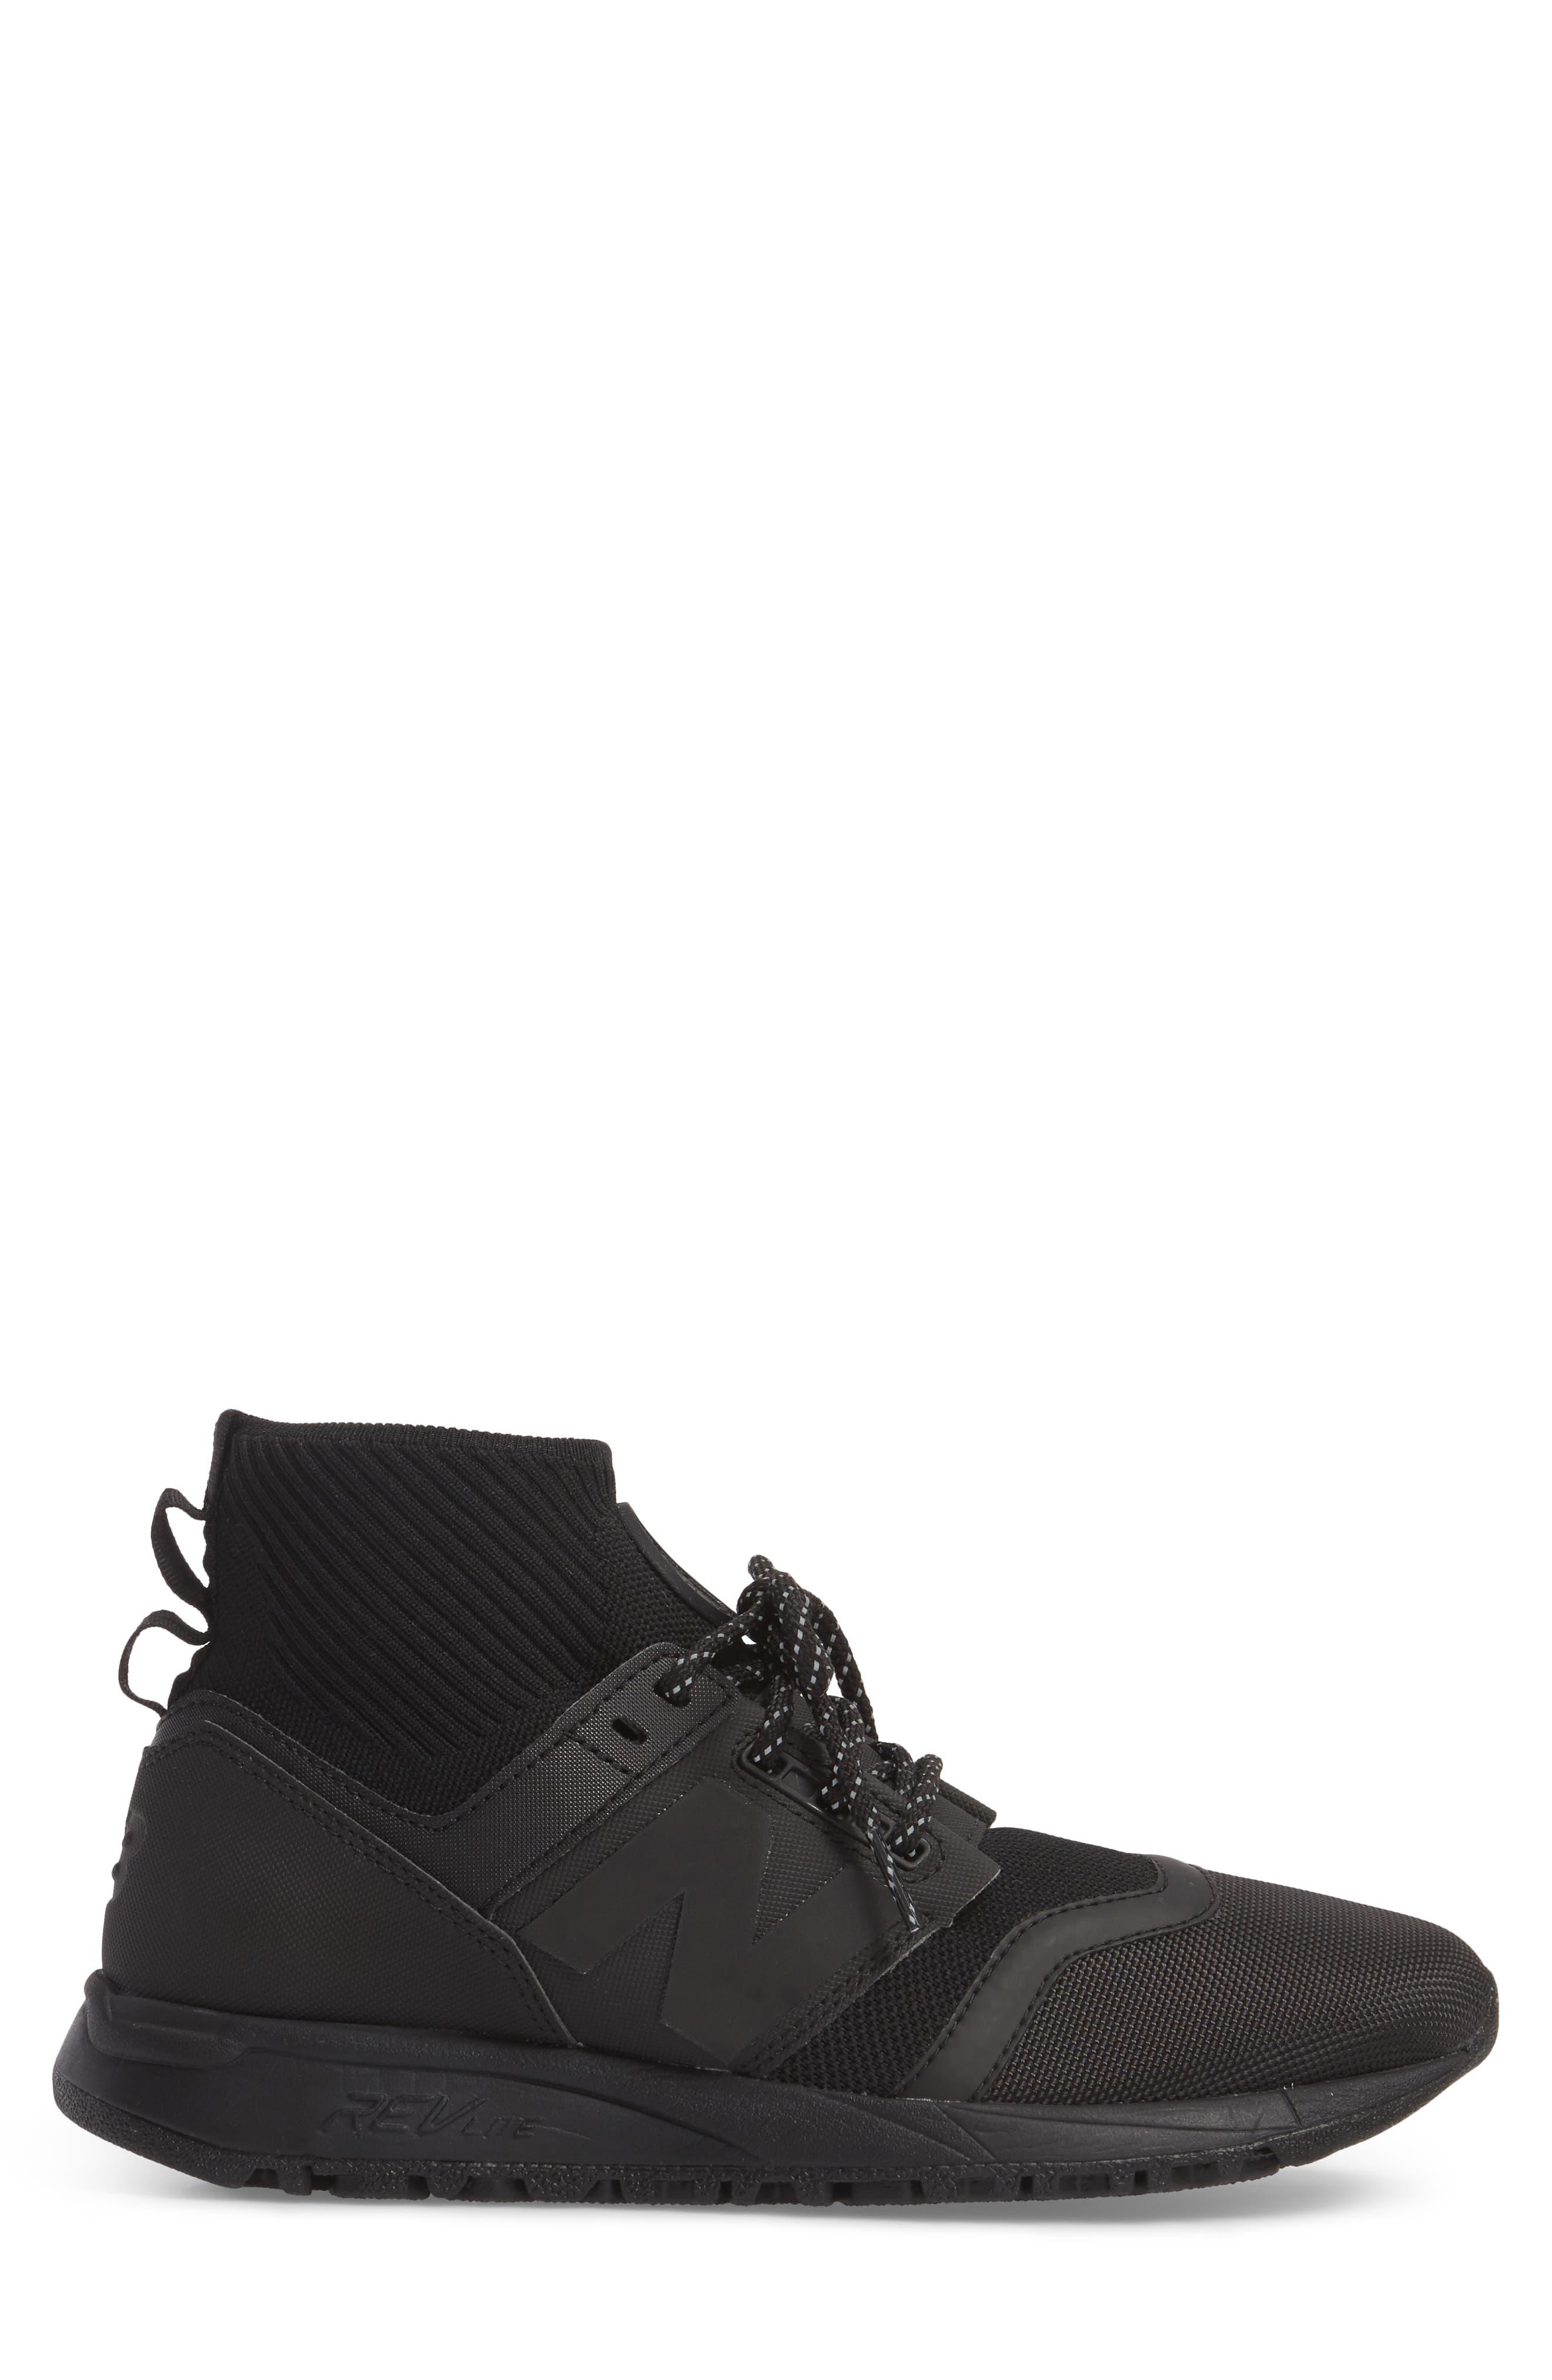 247 Mid Sneaker,                             Alternate thumbnail 9, color,